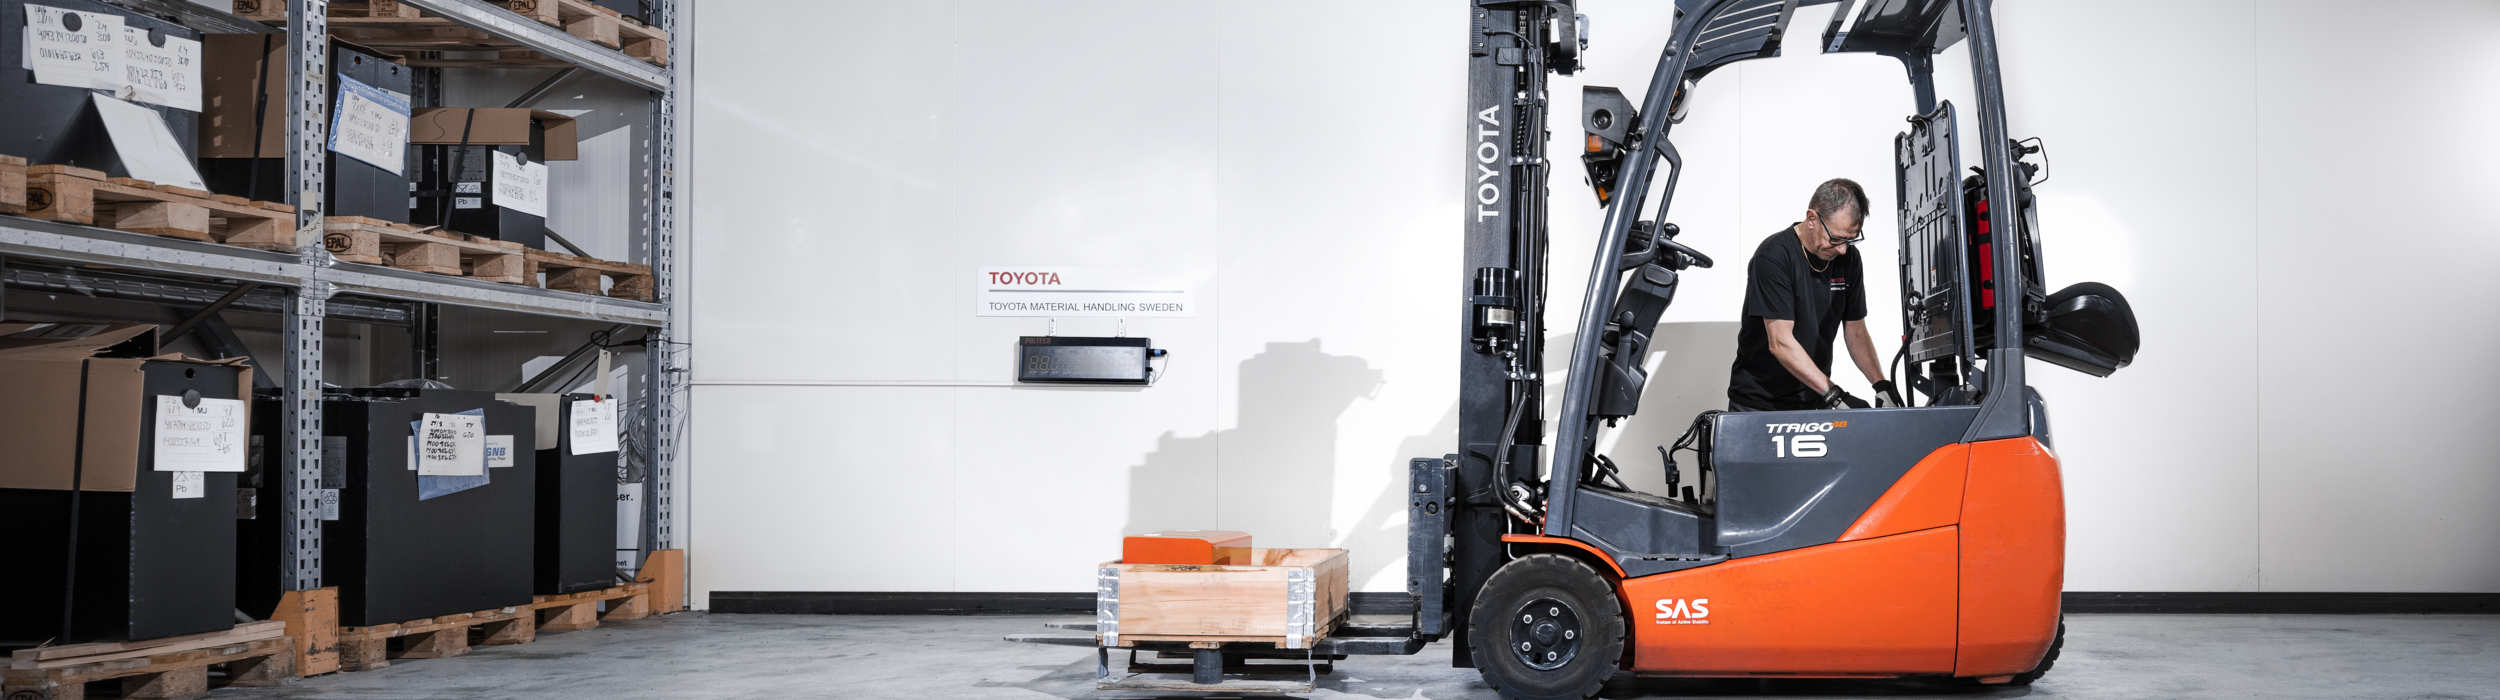 Forklift repair service Toyota